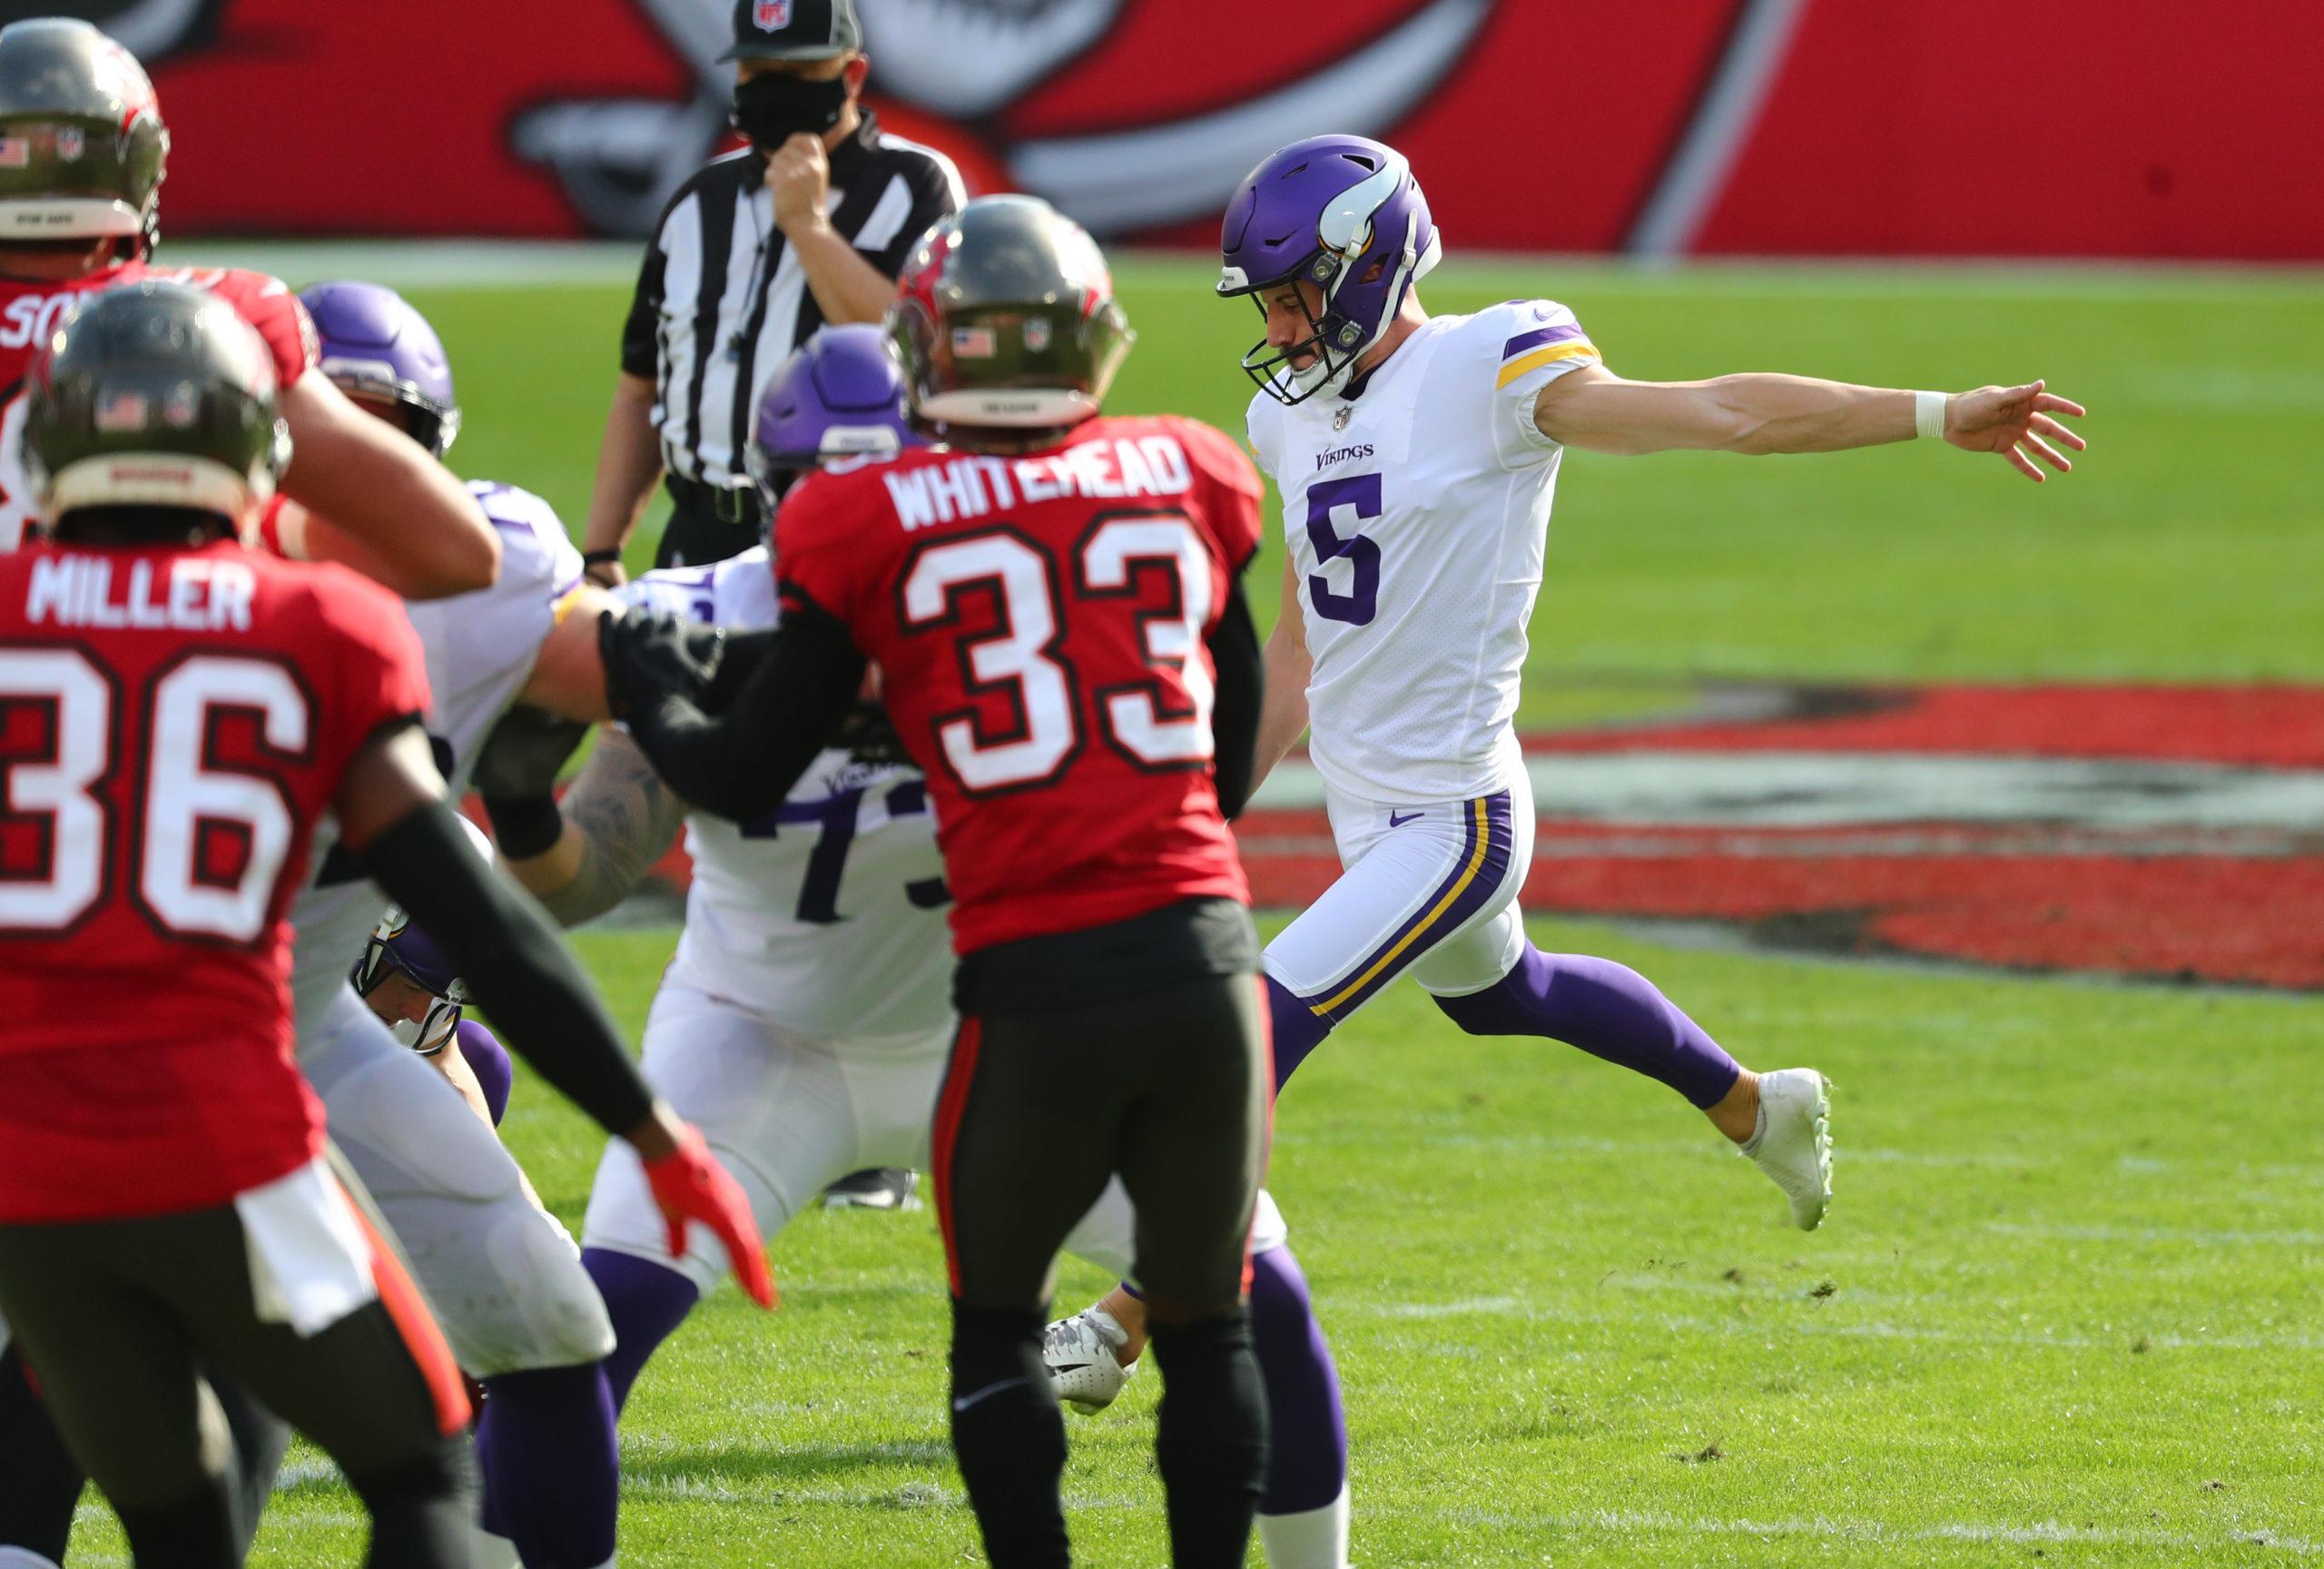 NFL: Minnesota Vikings at Tampa Bay Buccaneers